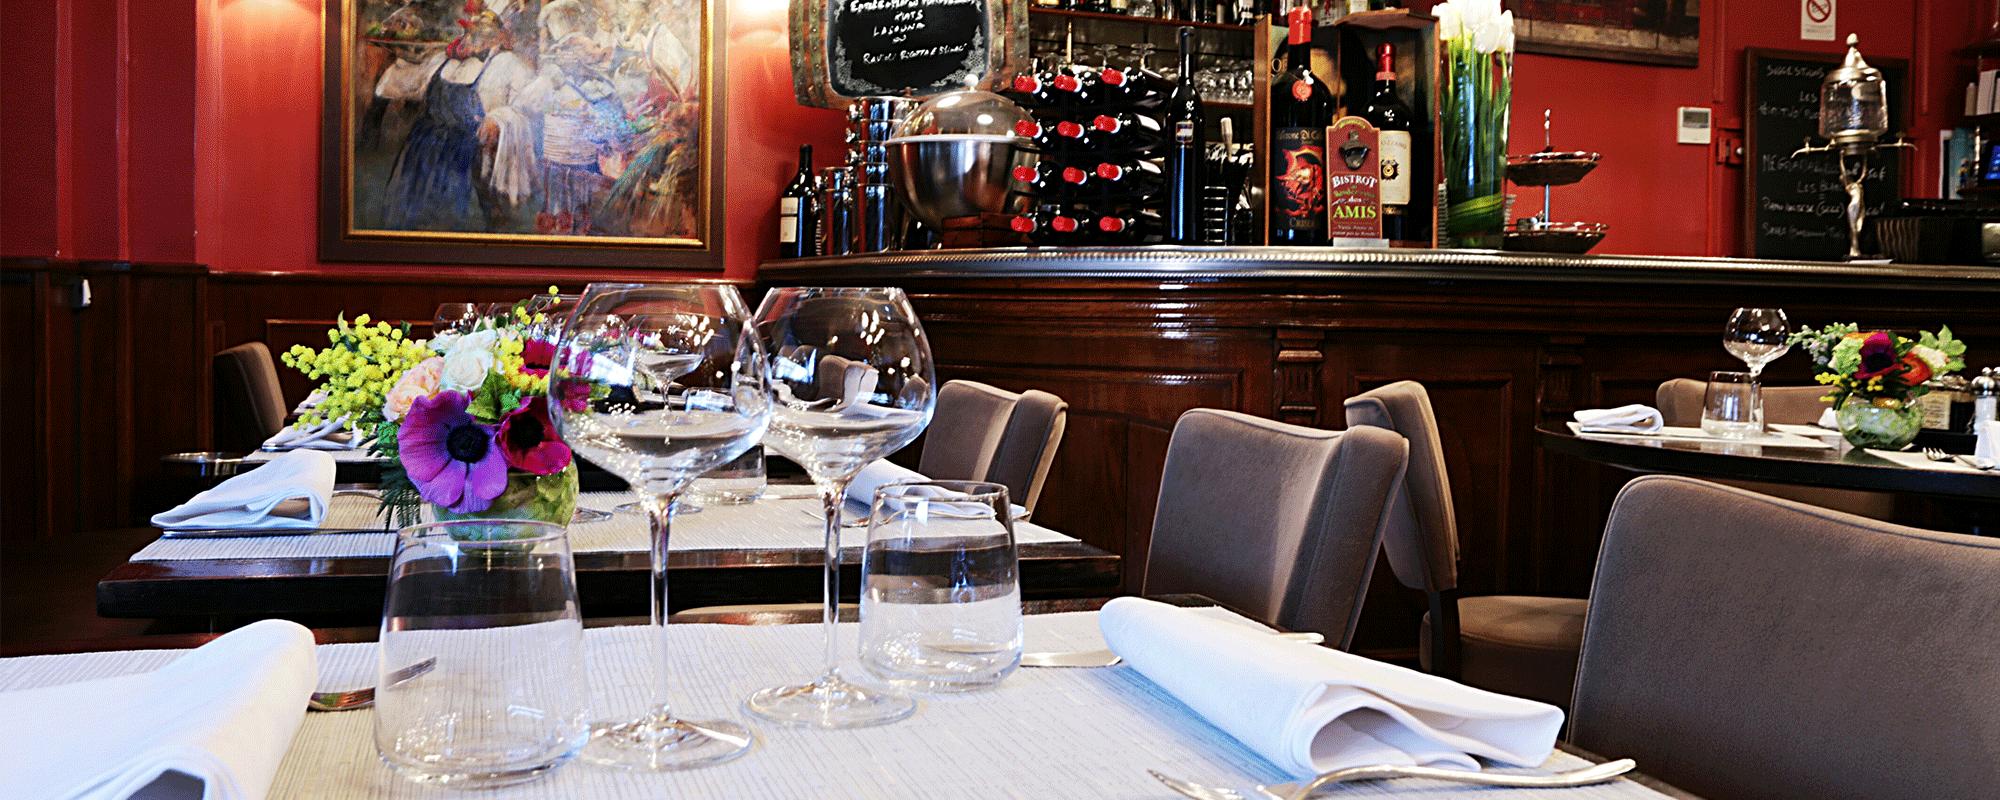 iannello restaurant italien paris 16 me arrondissement. Black Bedroom Furniture Sets. Home Design Ideas